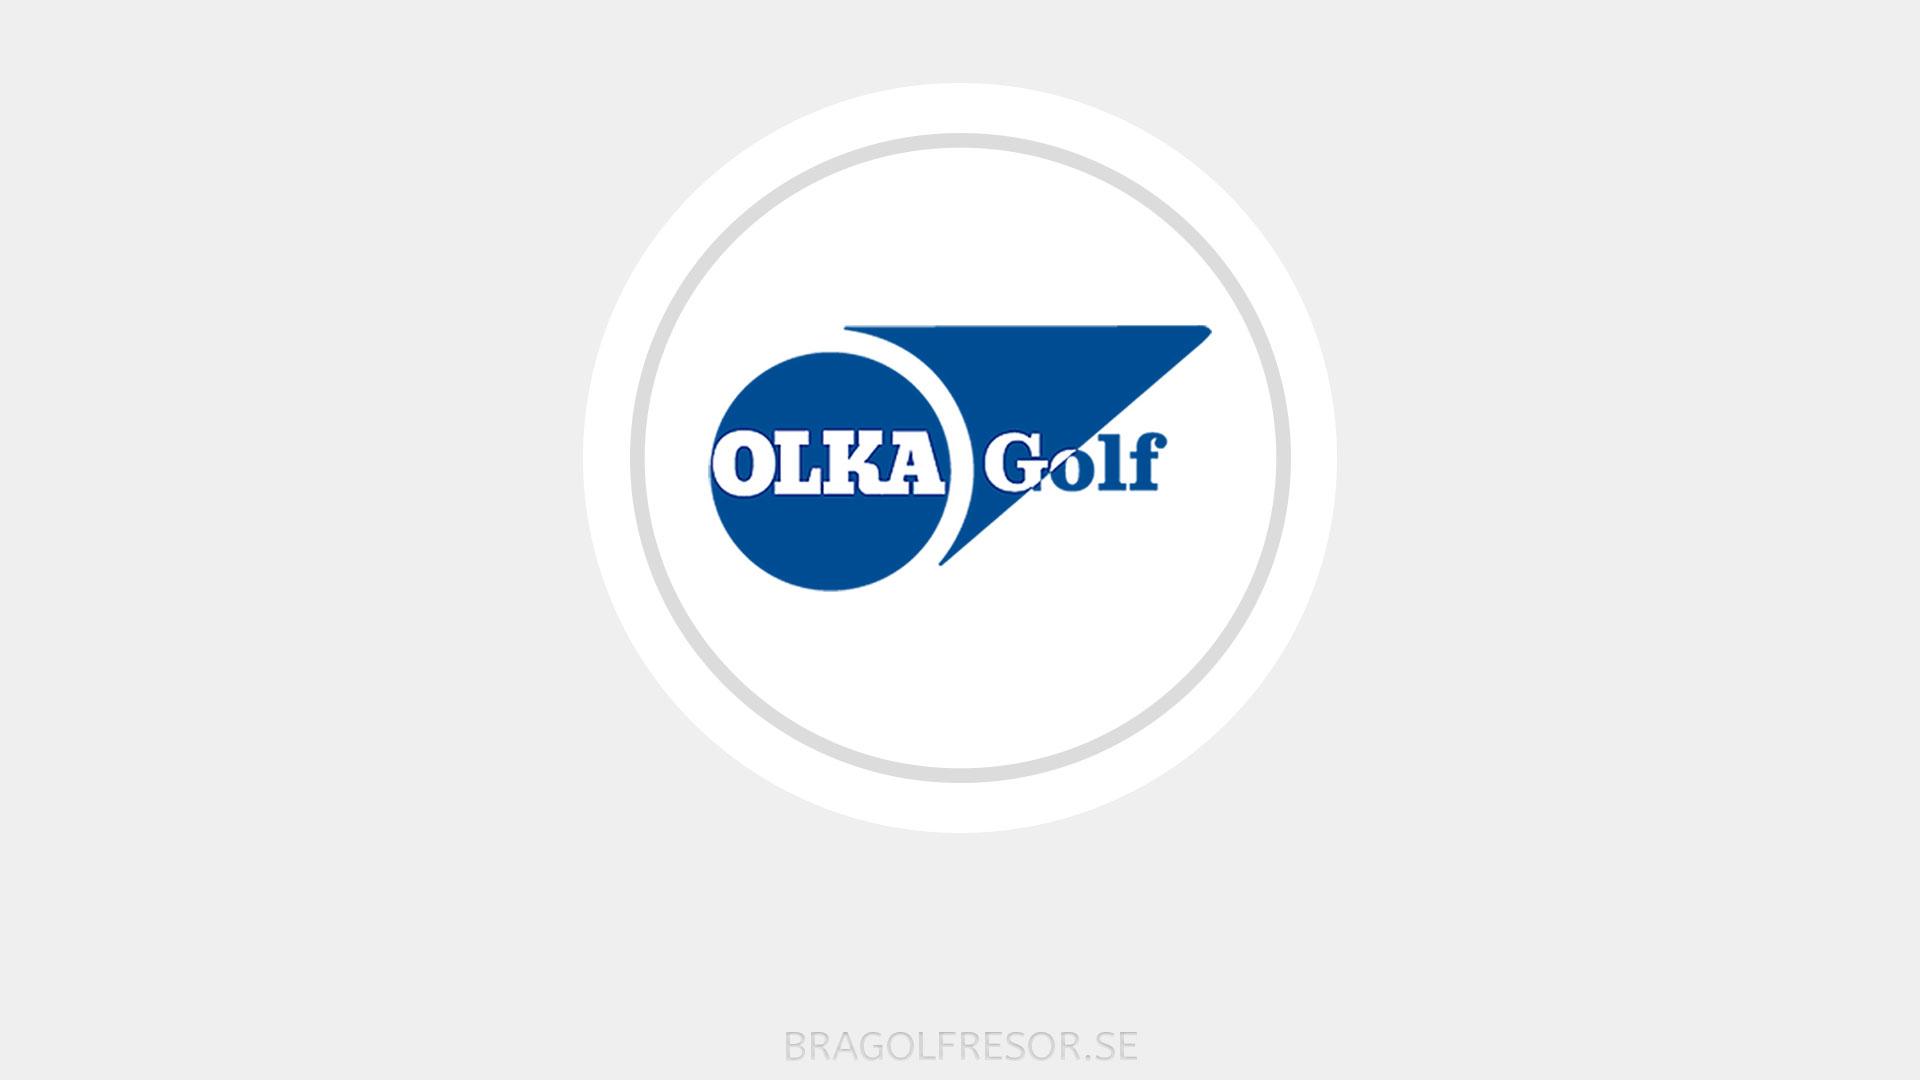 Olka Golf